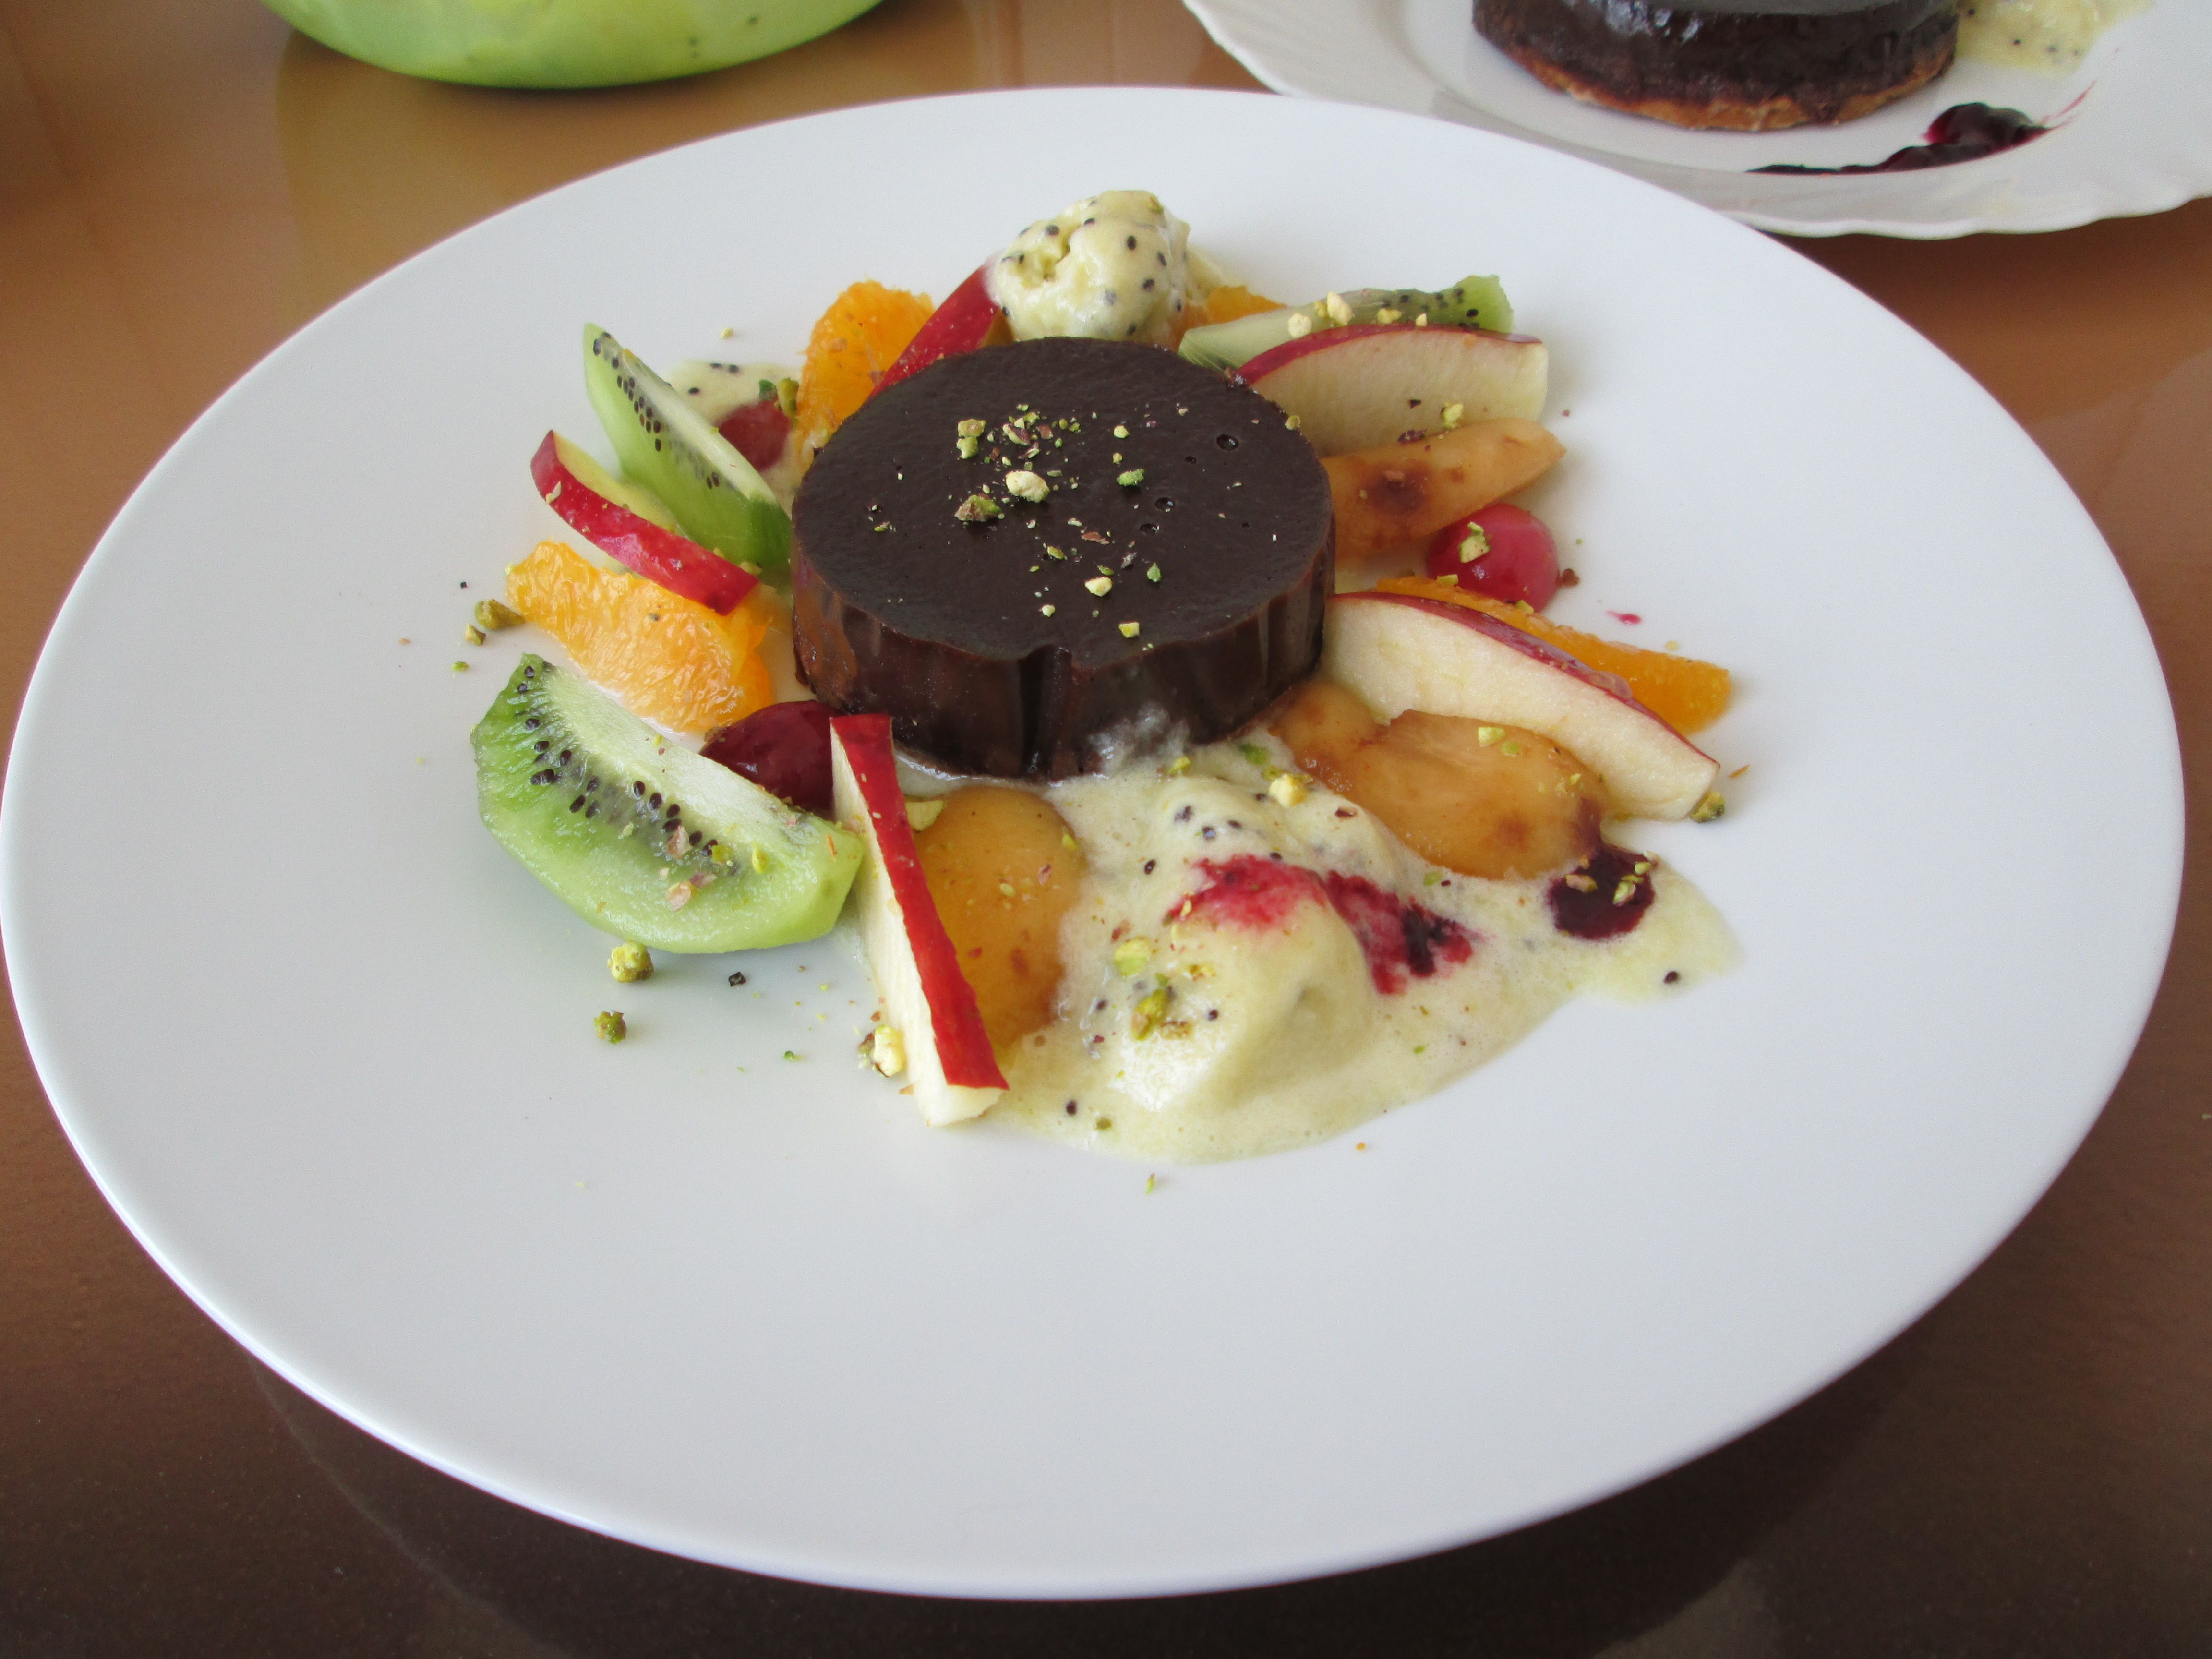 Petit  tarte  aux   chocolate   et   fruits  frais macedoine  .   Gino D'Aquino ___________